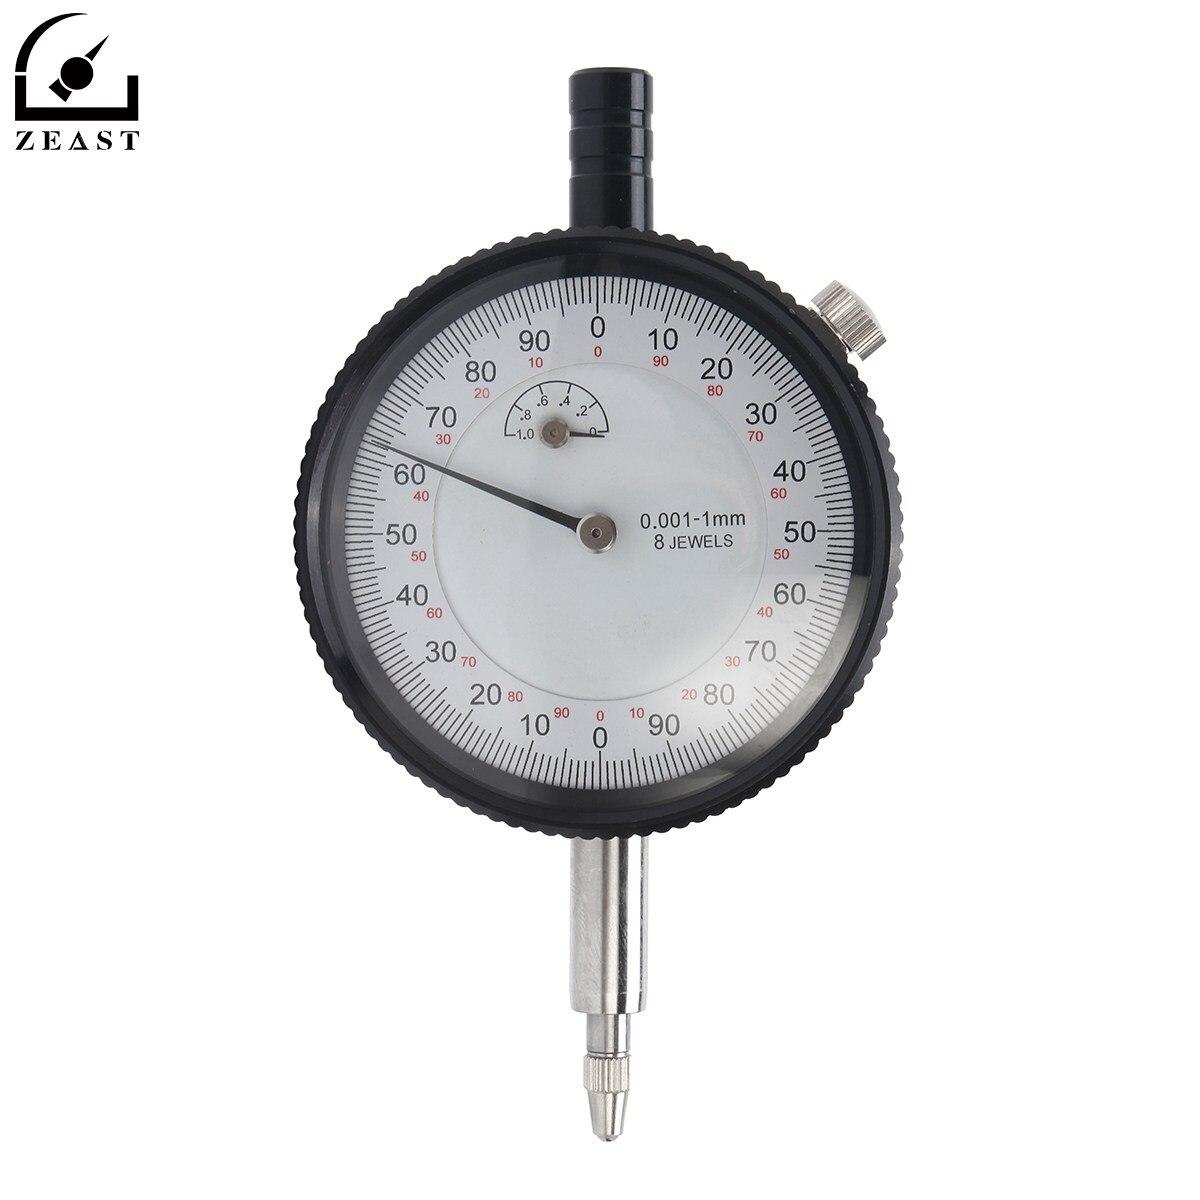 Micron Dial Gauge Test Indicator Precision 0-1mm 0.001mm Indicators Tool<br>